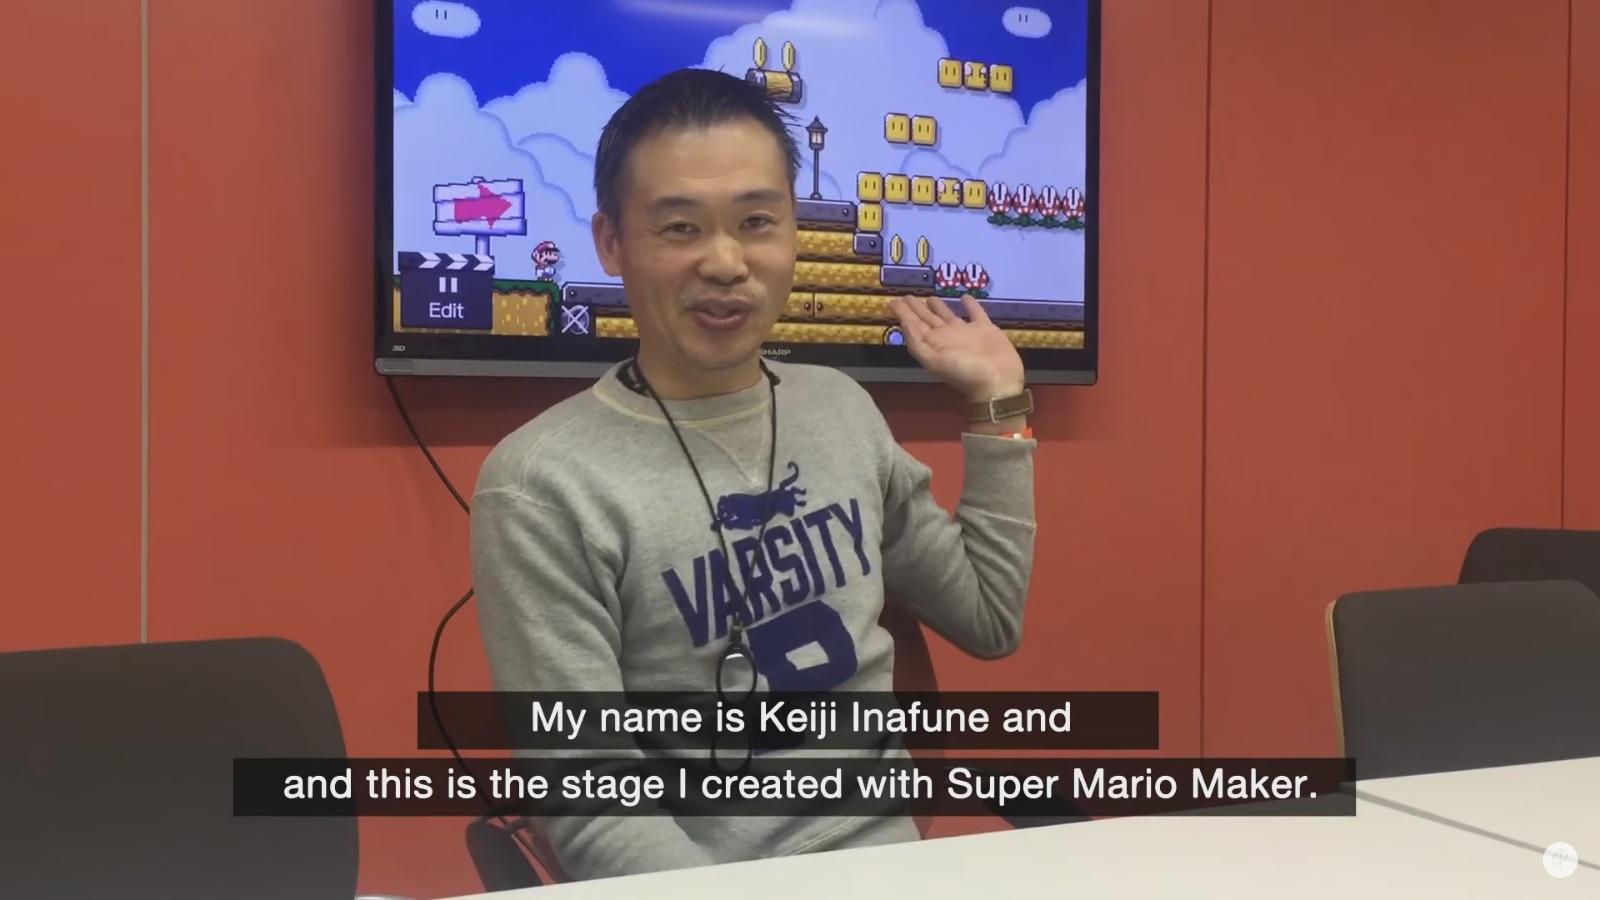 Keiji Inafune makes a Super Mario Maker level - Nintendo